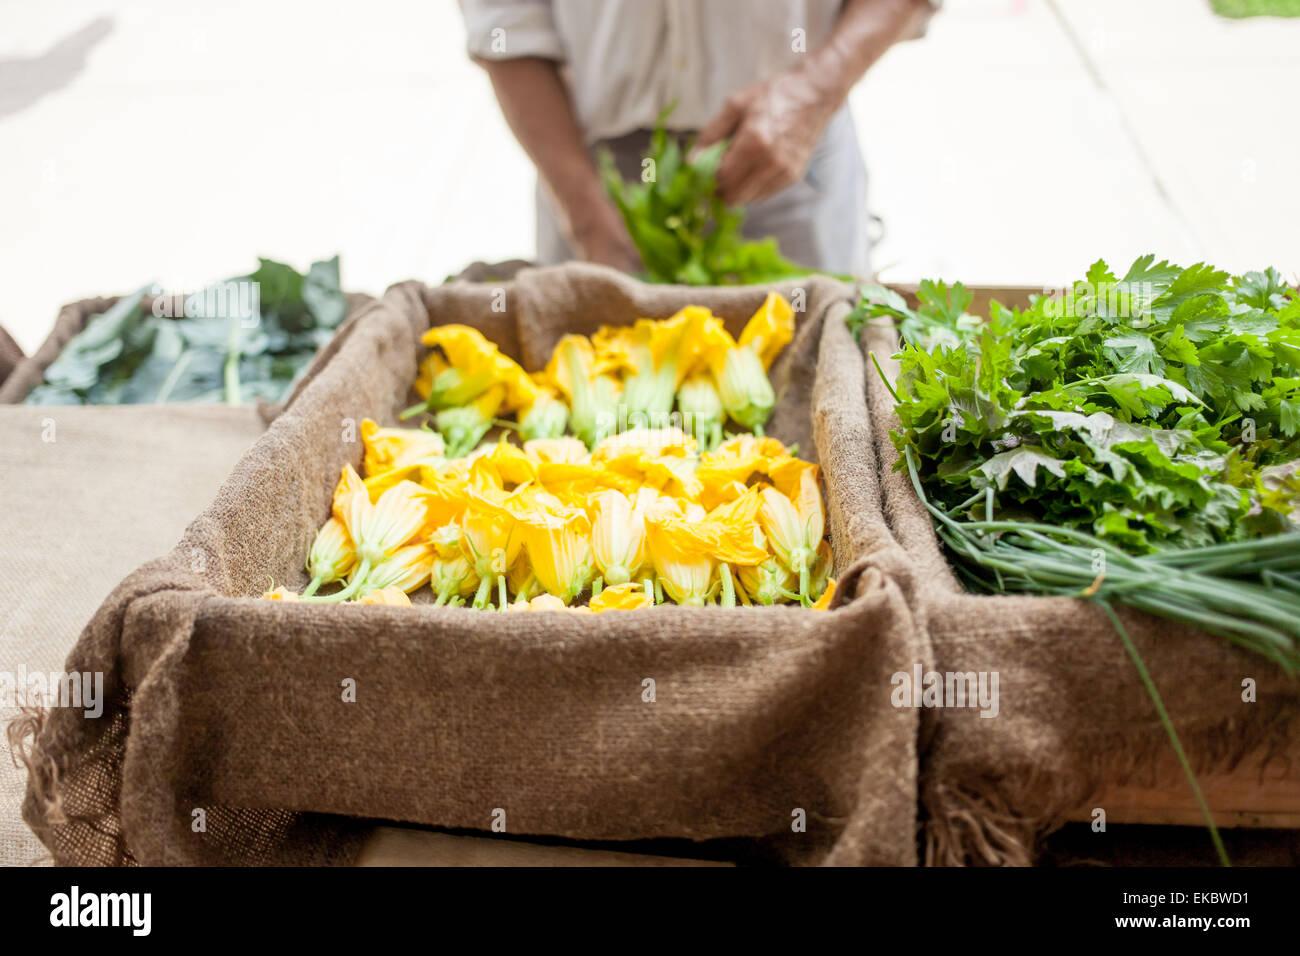 Farmer selling organic vegetables on stall - Stock Image